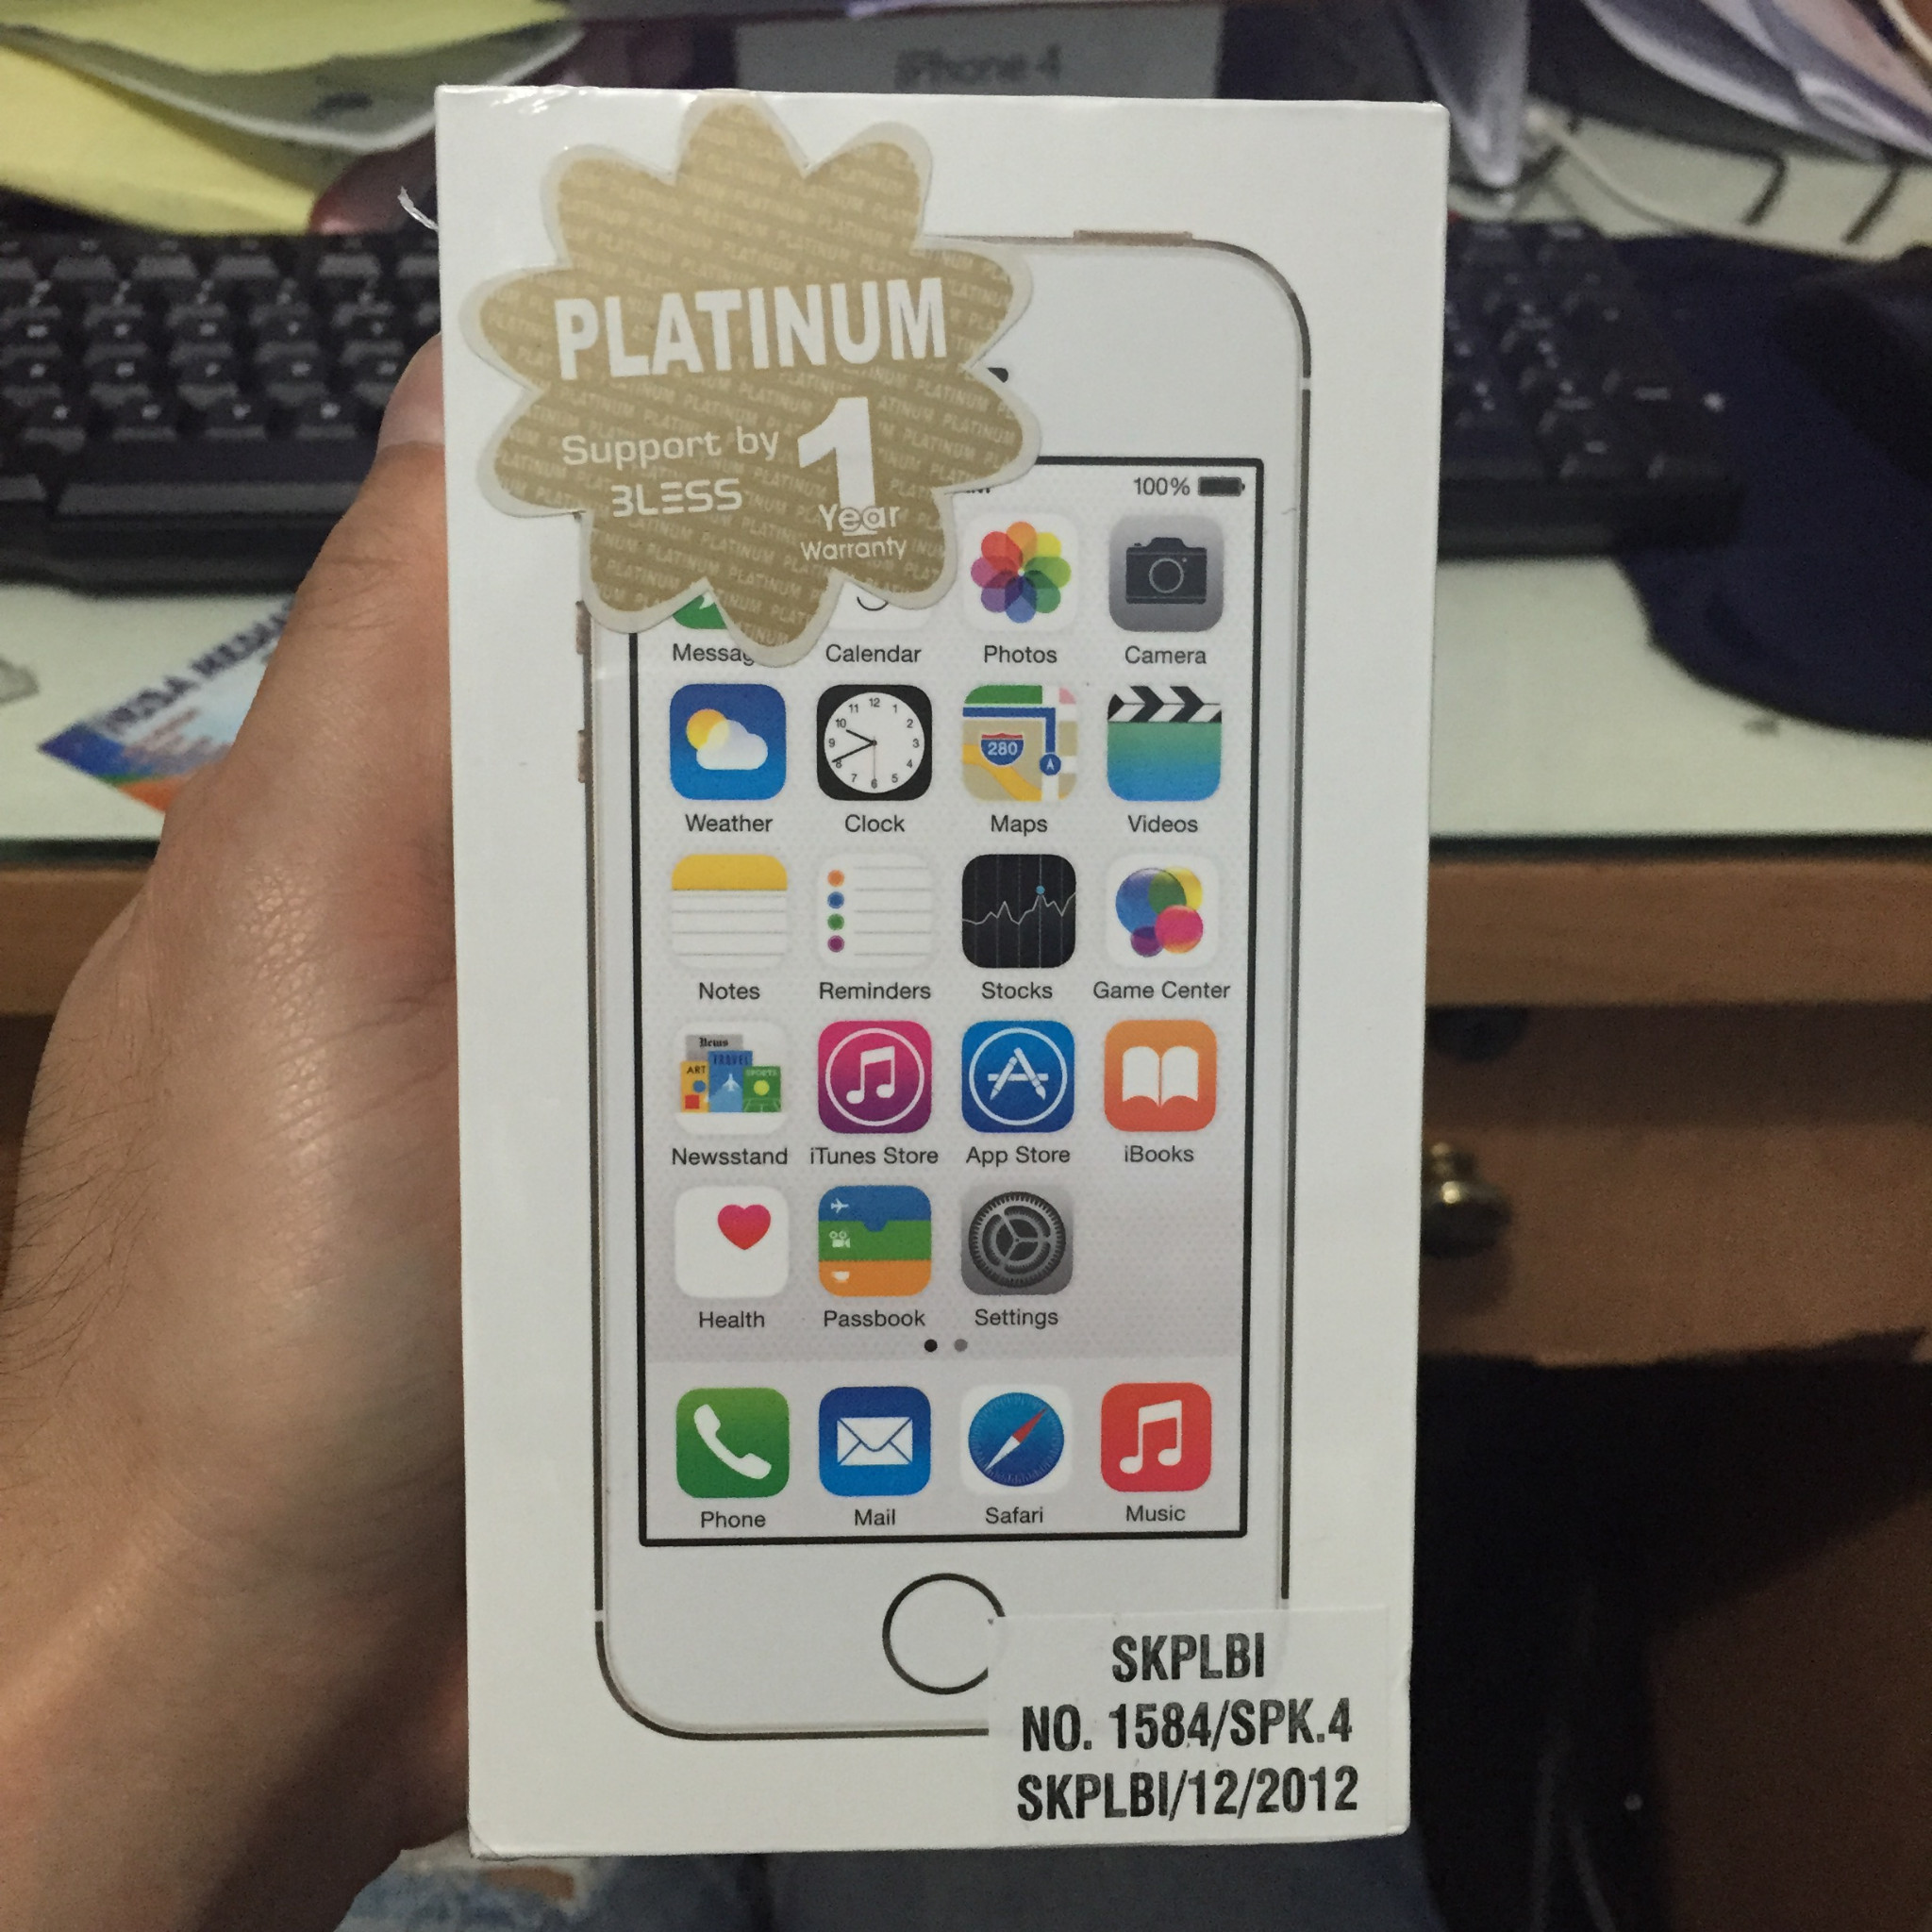 Iphone 5s 32gb Space Grey Garansi 1 Tahun Distributor Daftar Harga 6 64 Gb Gold Refurbished Source Aktif